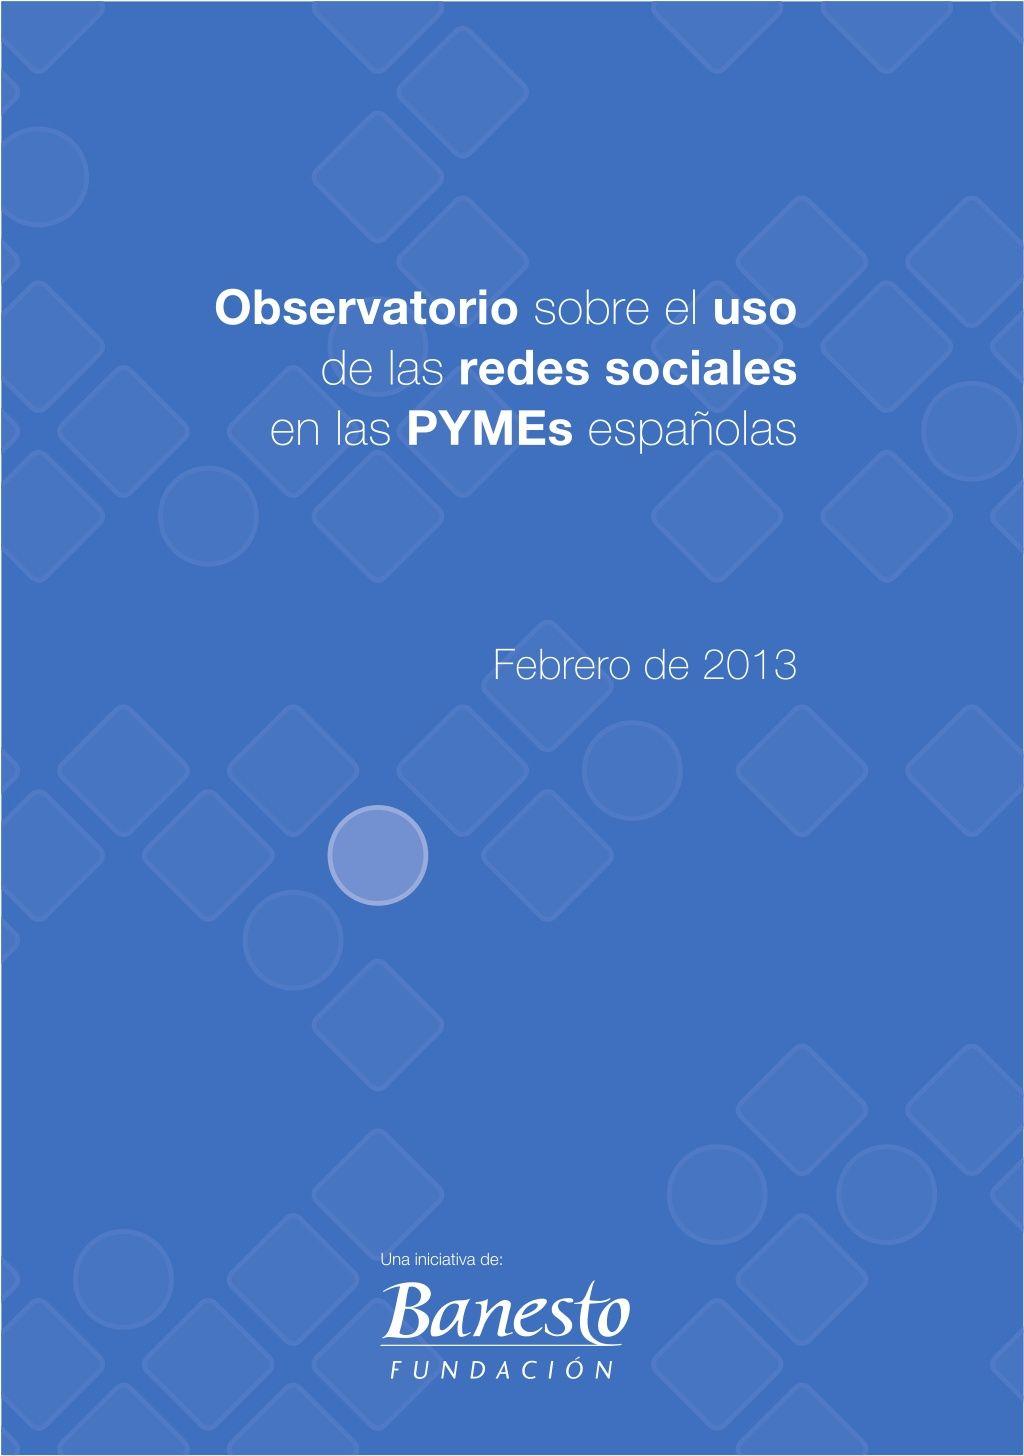 Observatorio PYMES y redes sociales Febrero2013 #ecommerce #rrss